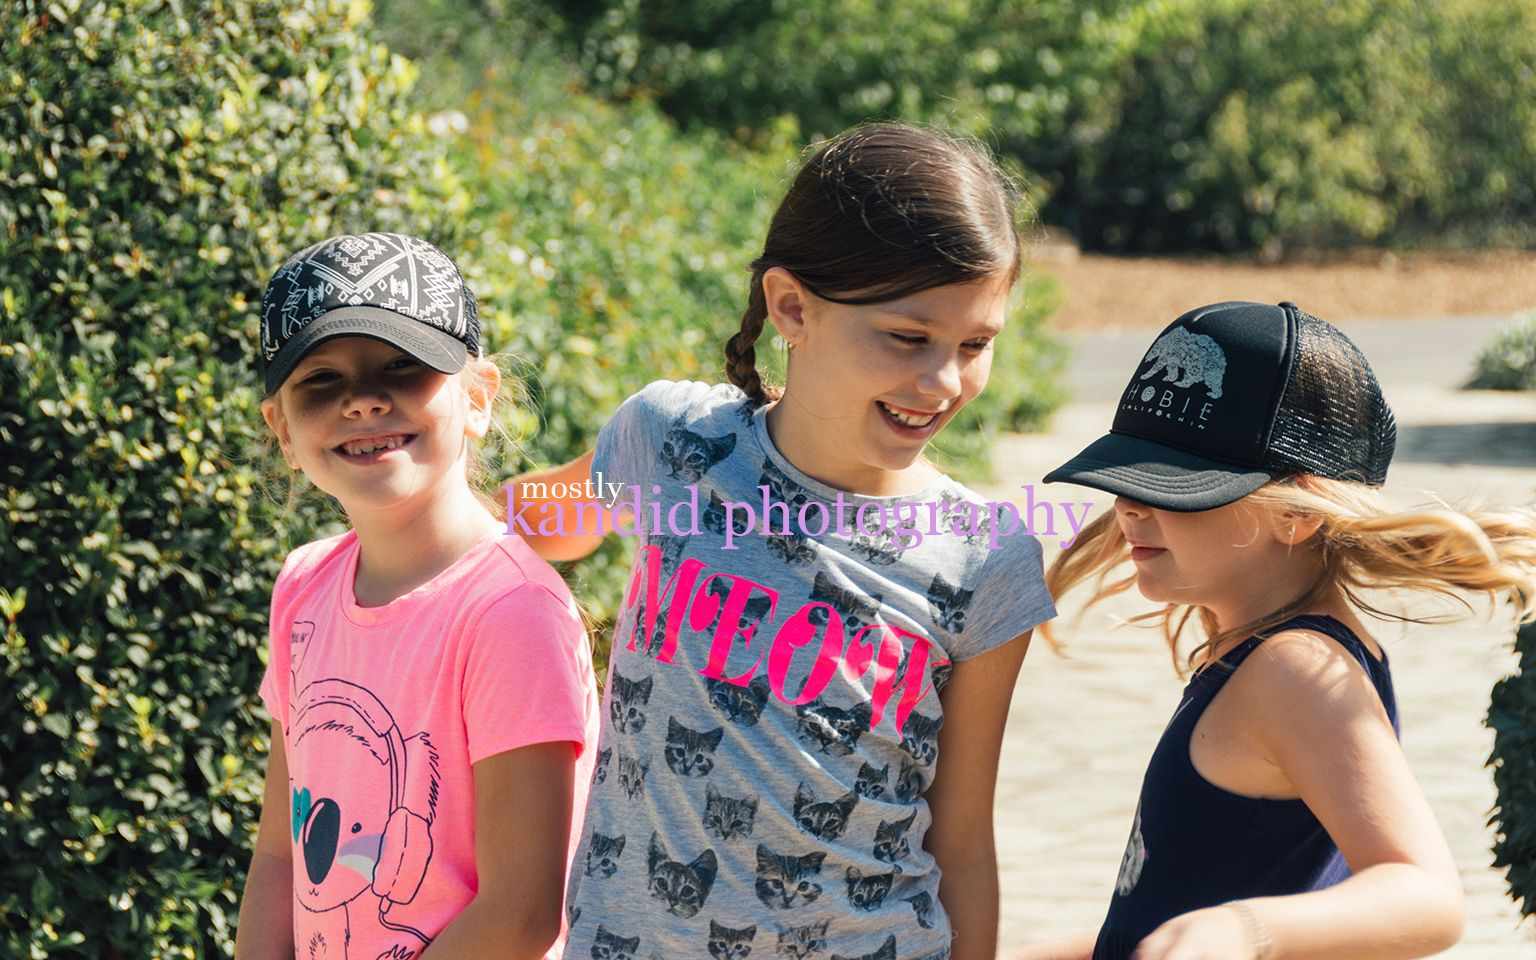 www.mostlykandid.com   #BFFs #girls #kids #children #family #fun #photography #candid #socal #orangecounty   @mostlykandid on Instagram